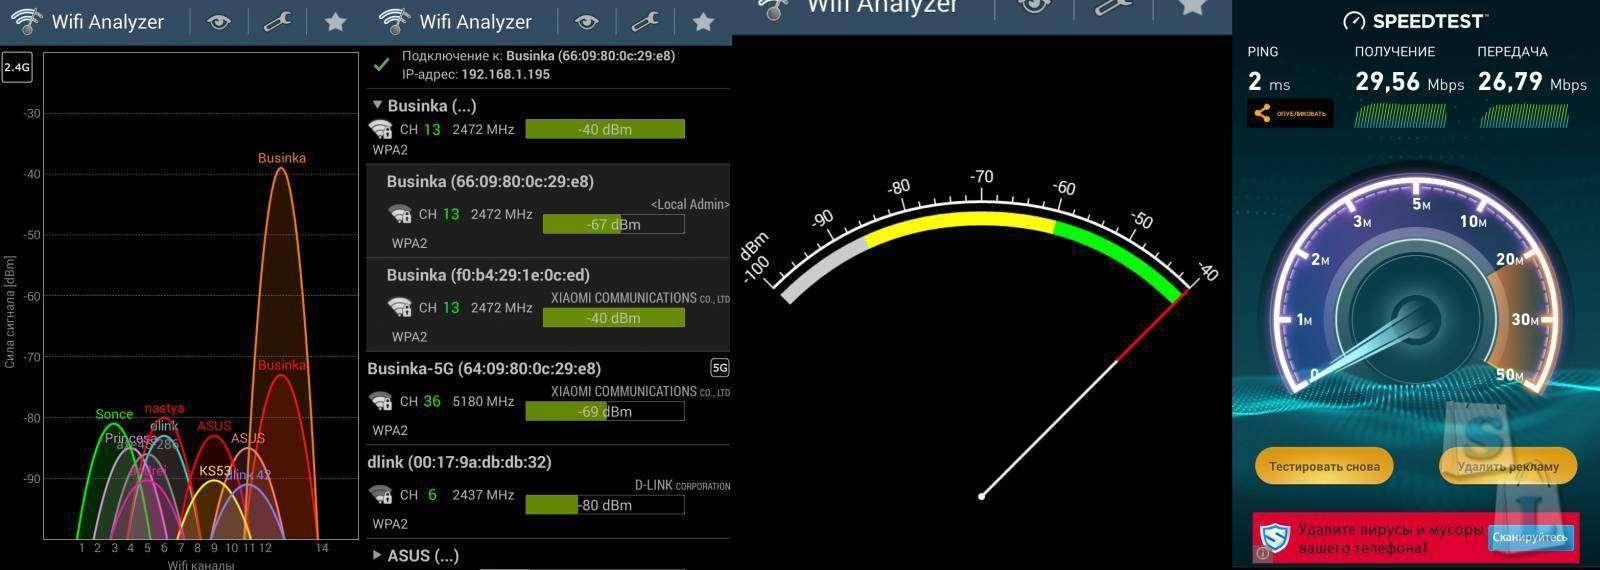 GearBest: Обзор роутера XiaoMi Mi WiFi Router Youth Edition - младший брат XiaoMi Mi WiFi Router